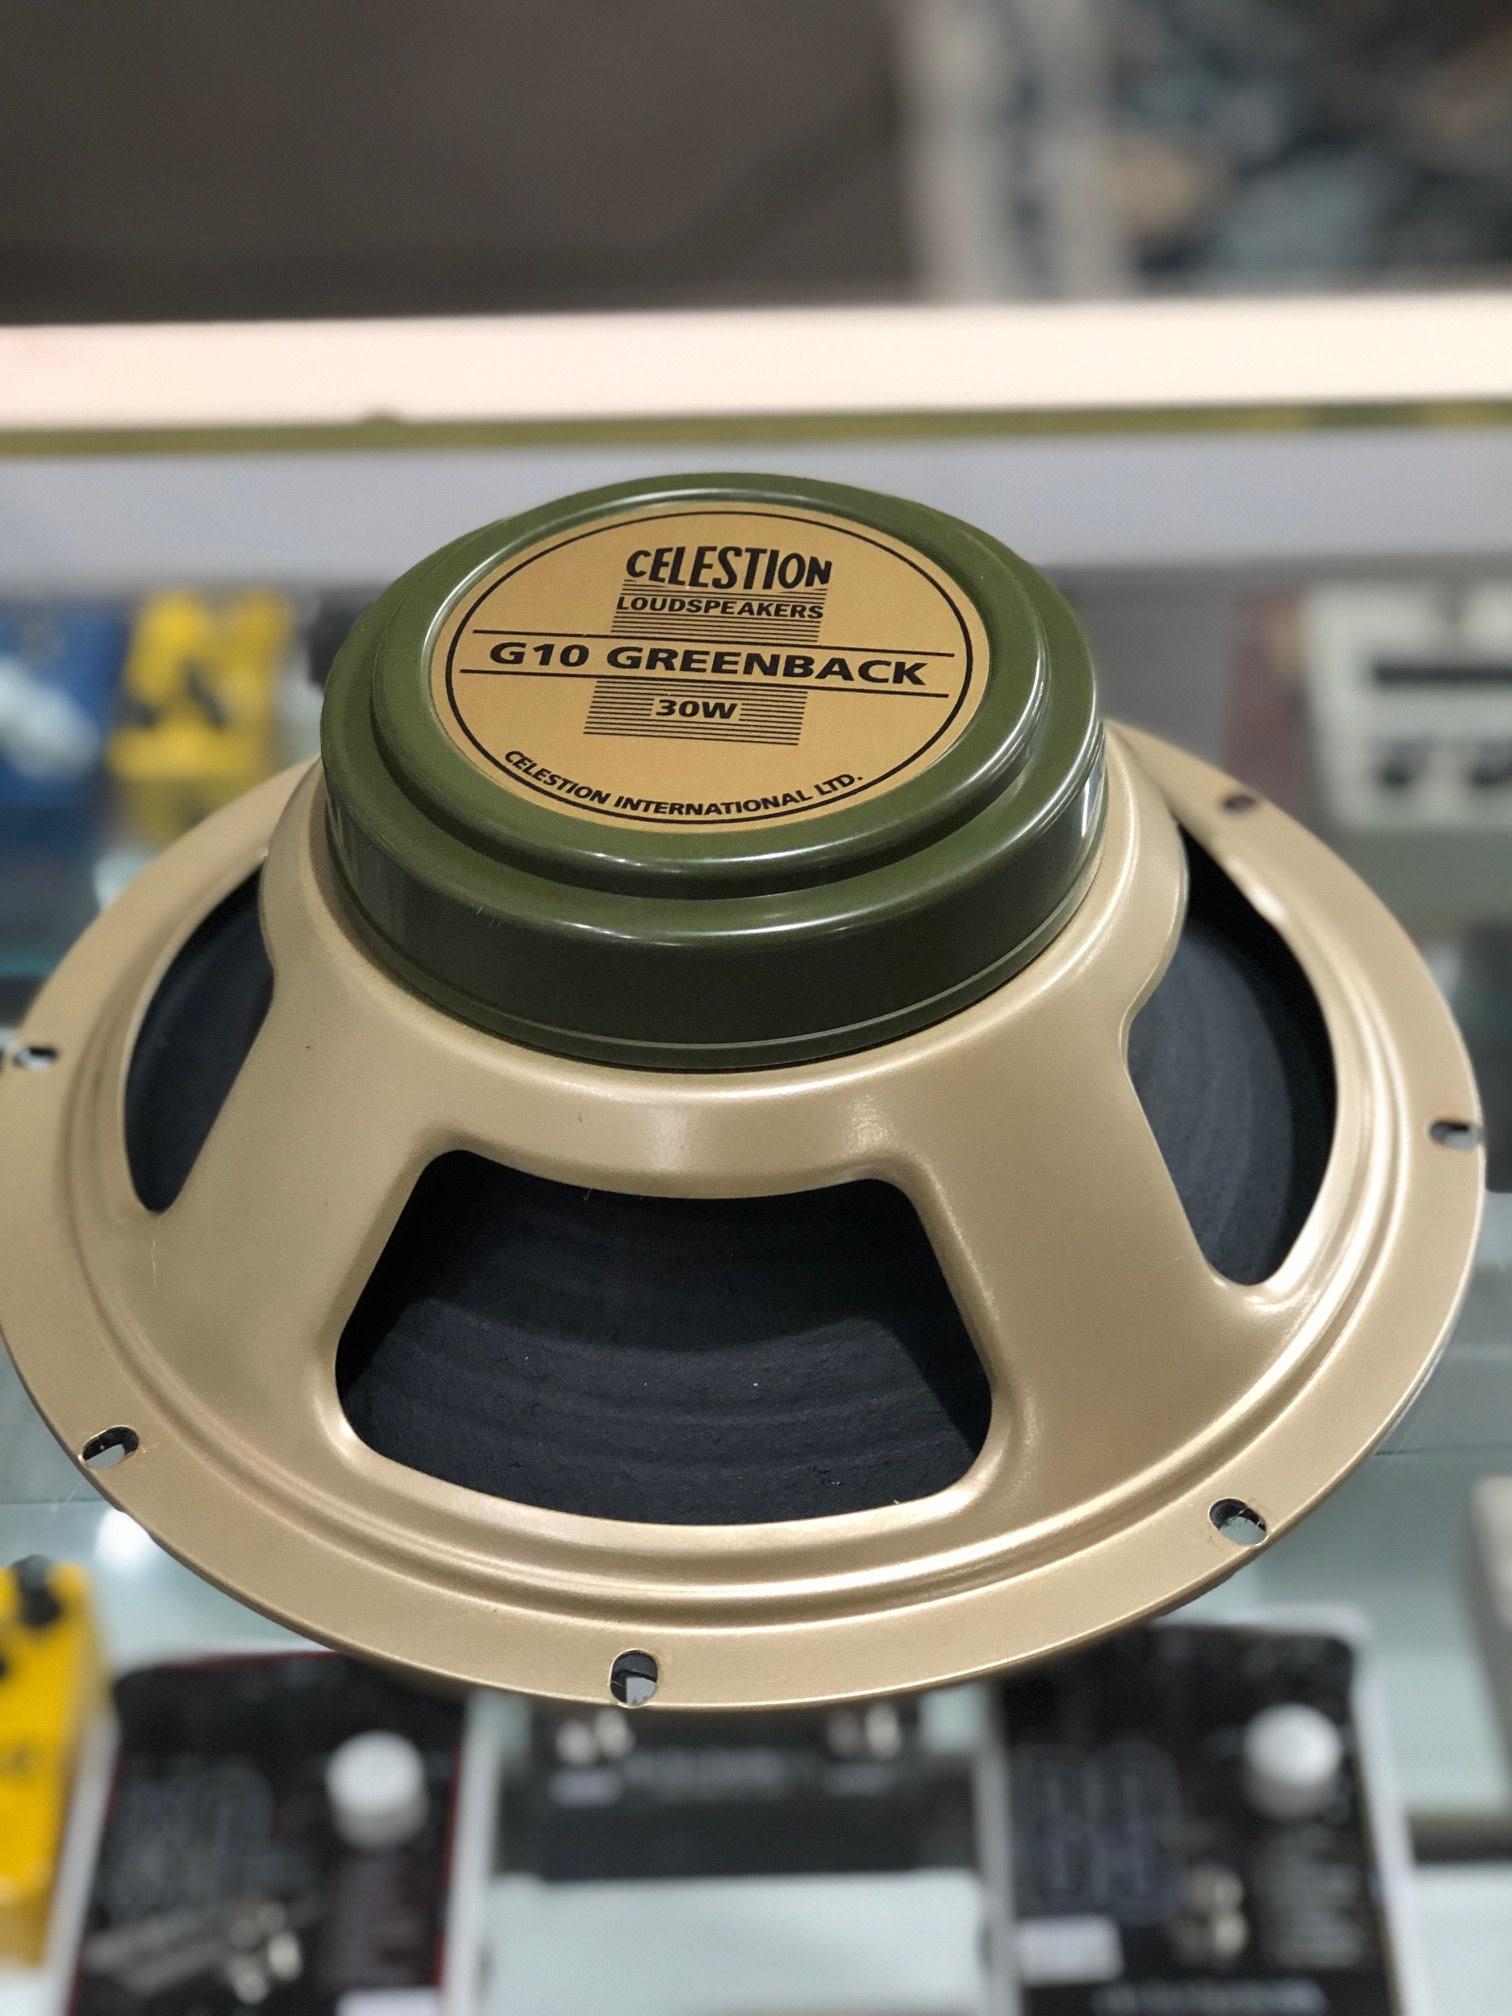 Celestion G10 Greenback 30 w-1